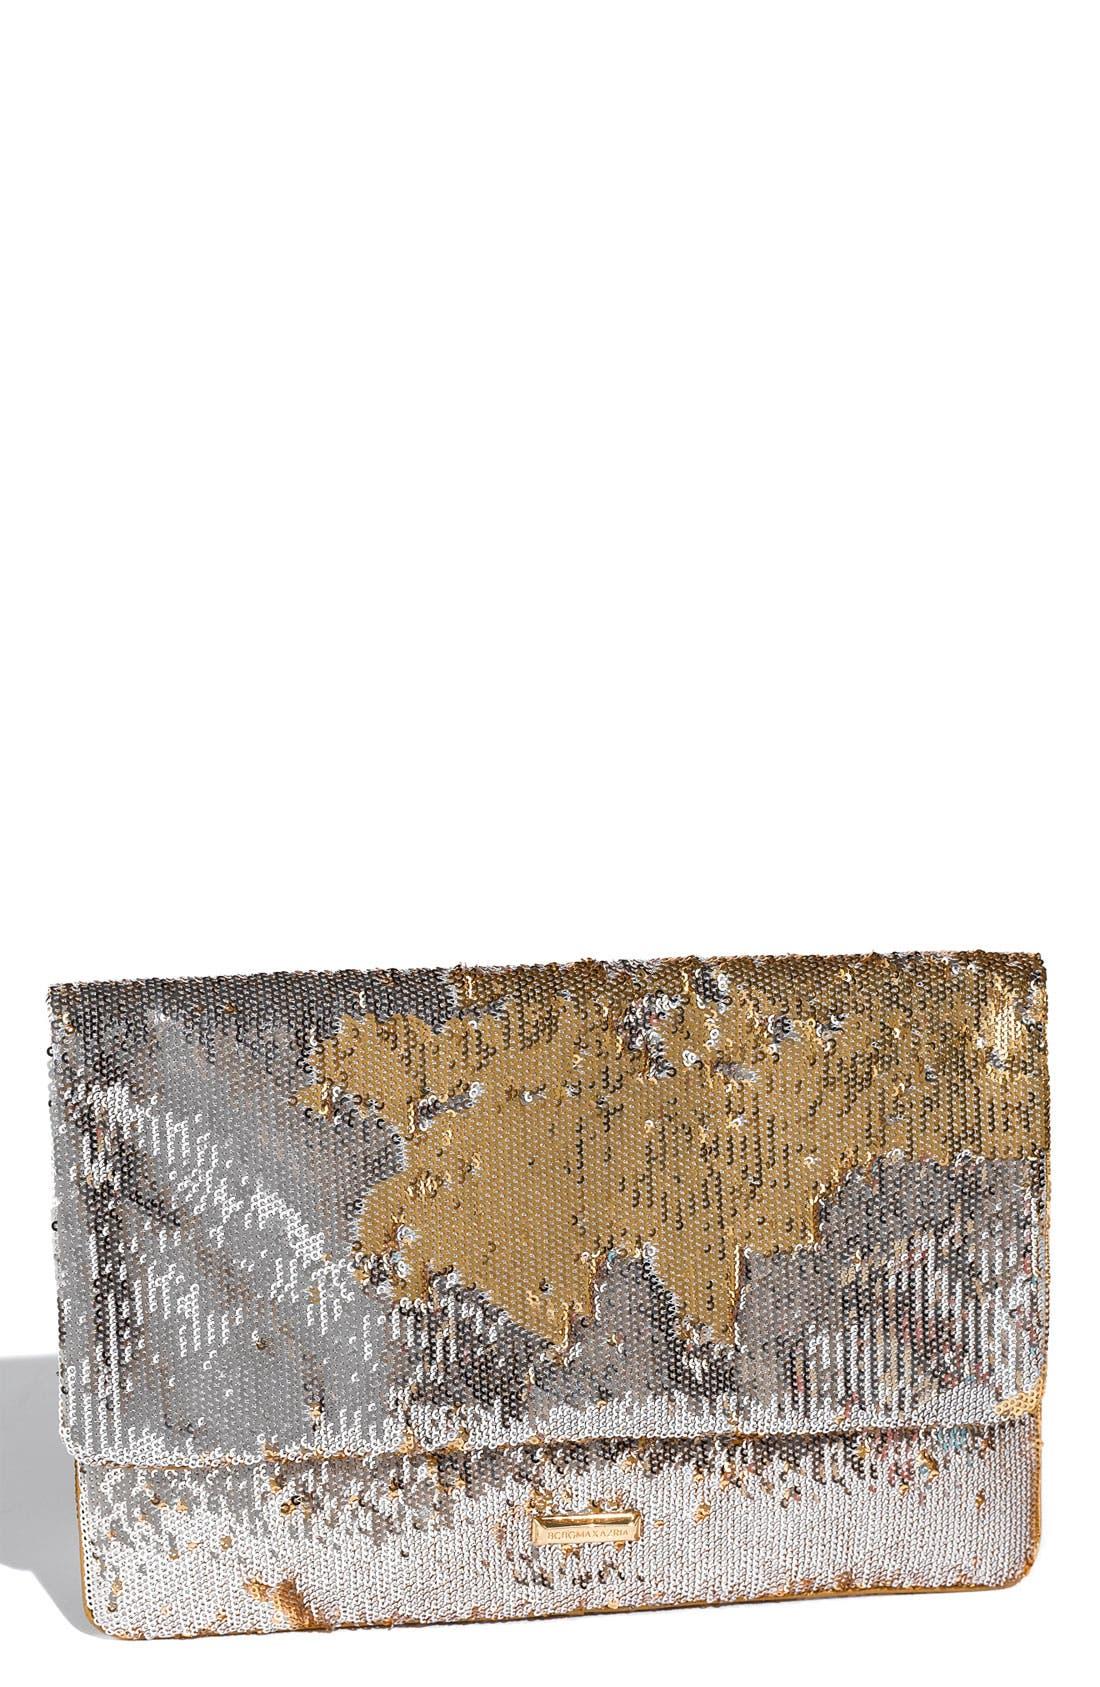 Alternate Image 1 Selected - BCBGMAXAZRIA Reversible Sequin Envelope Clutch